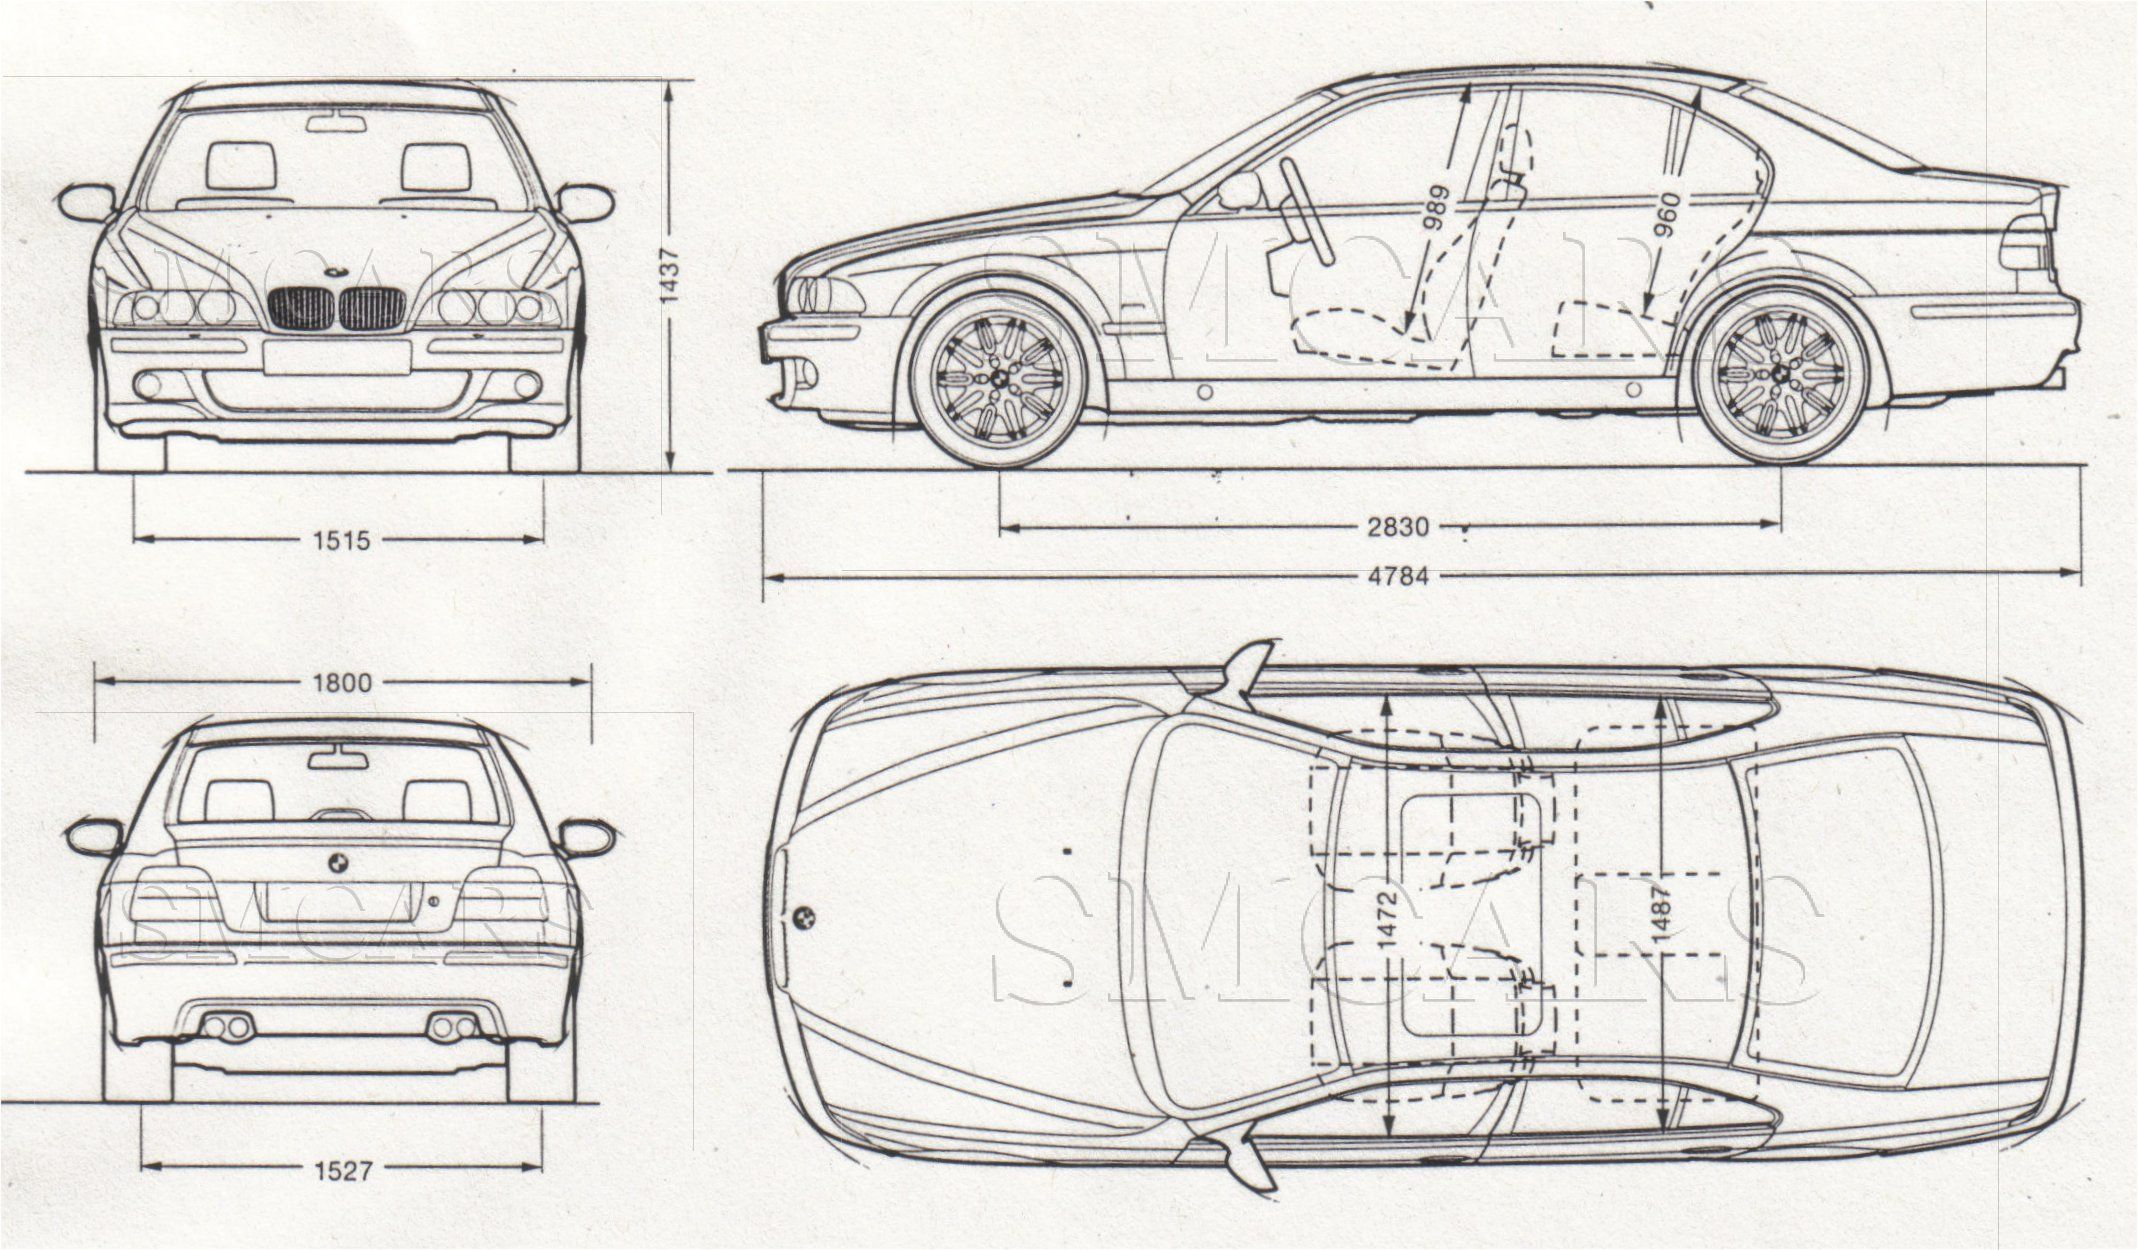 Tutorials3d blueprints bmw m5 cars pinterest bmw m5 cars malvernweather Choice Image